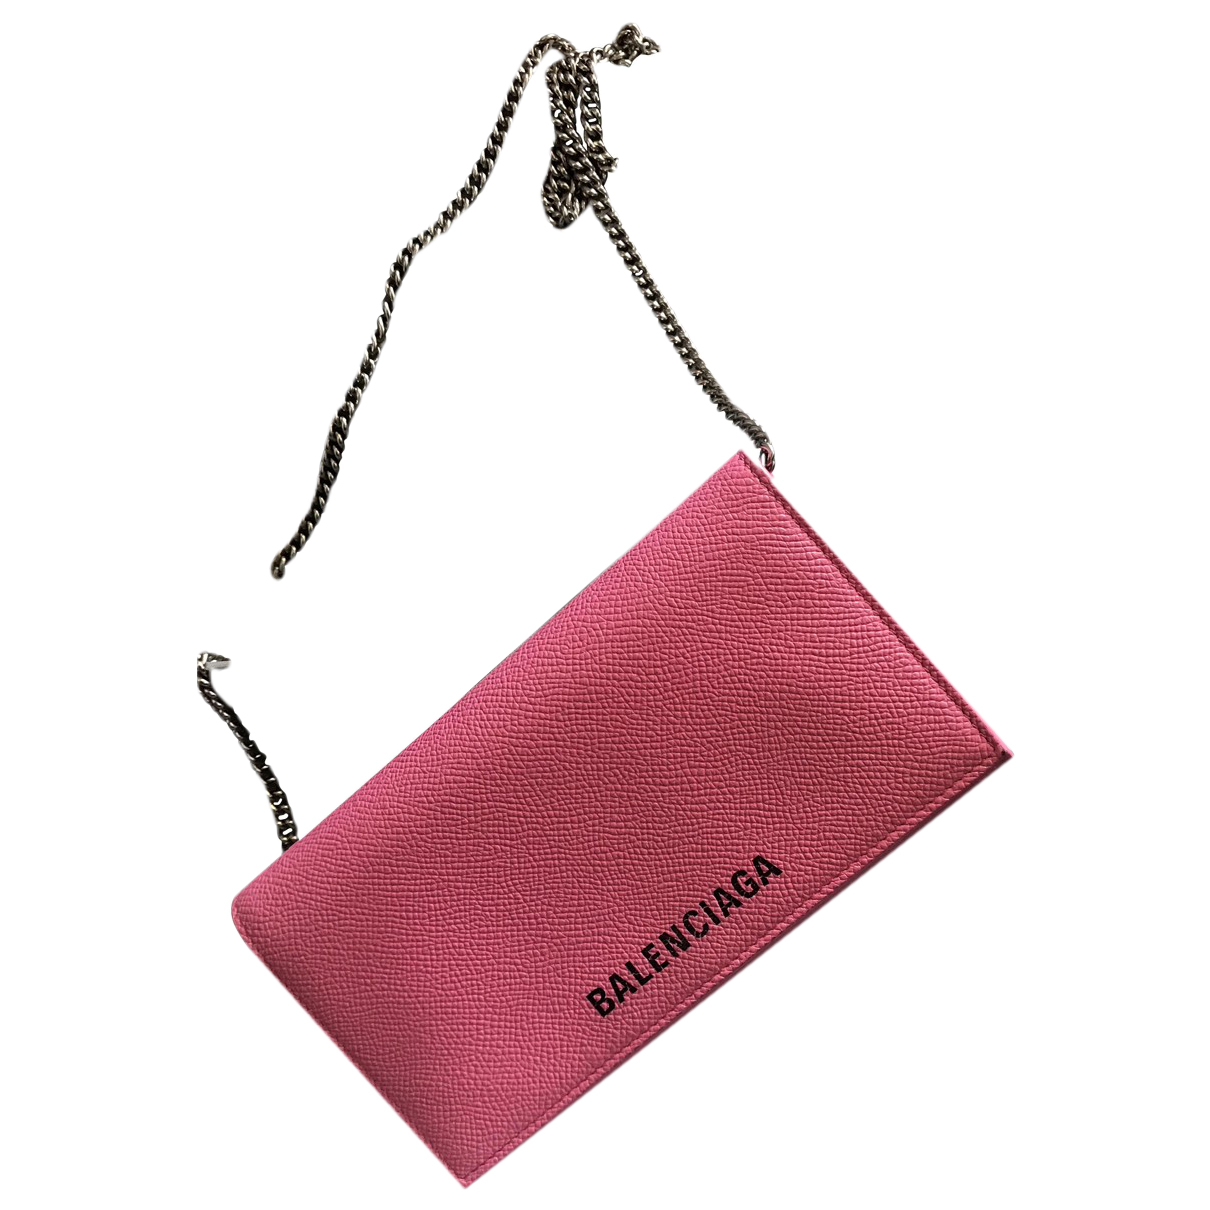 Balenciaga - Pochette Everyday pour femme en cuir - rose